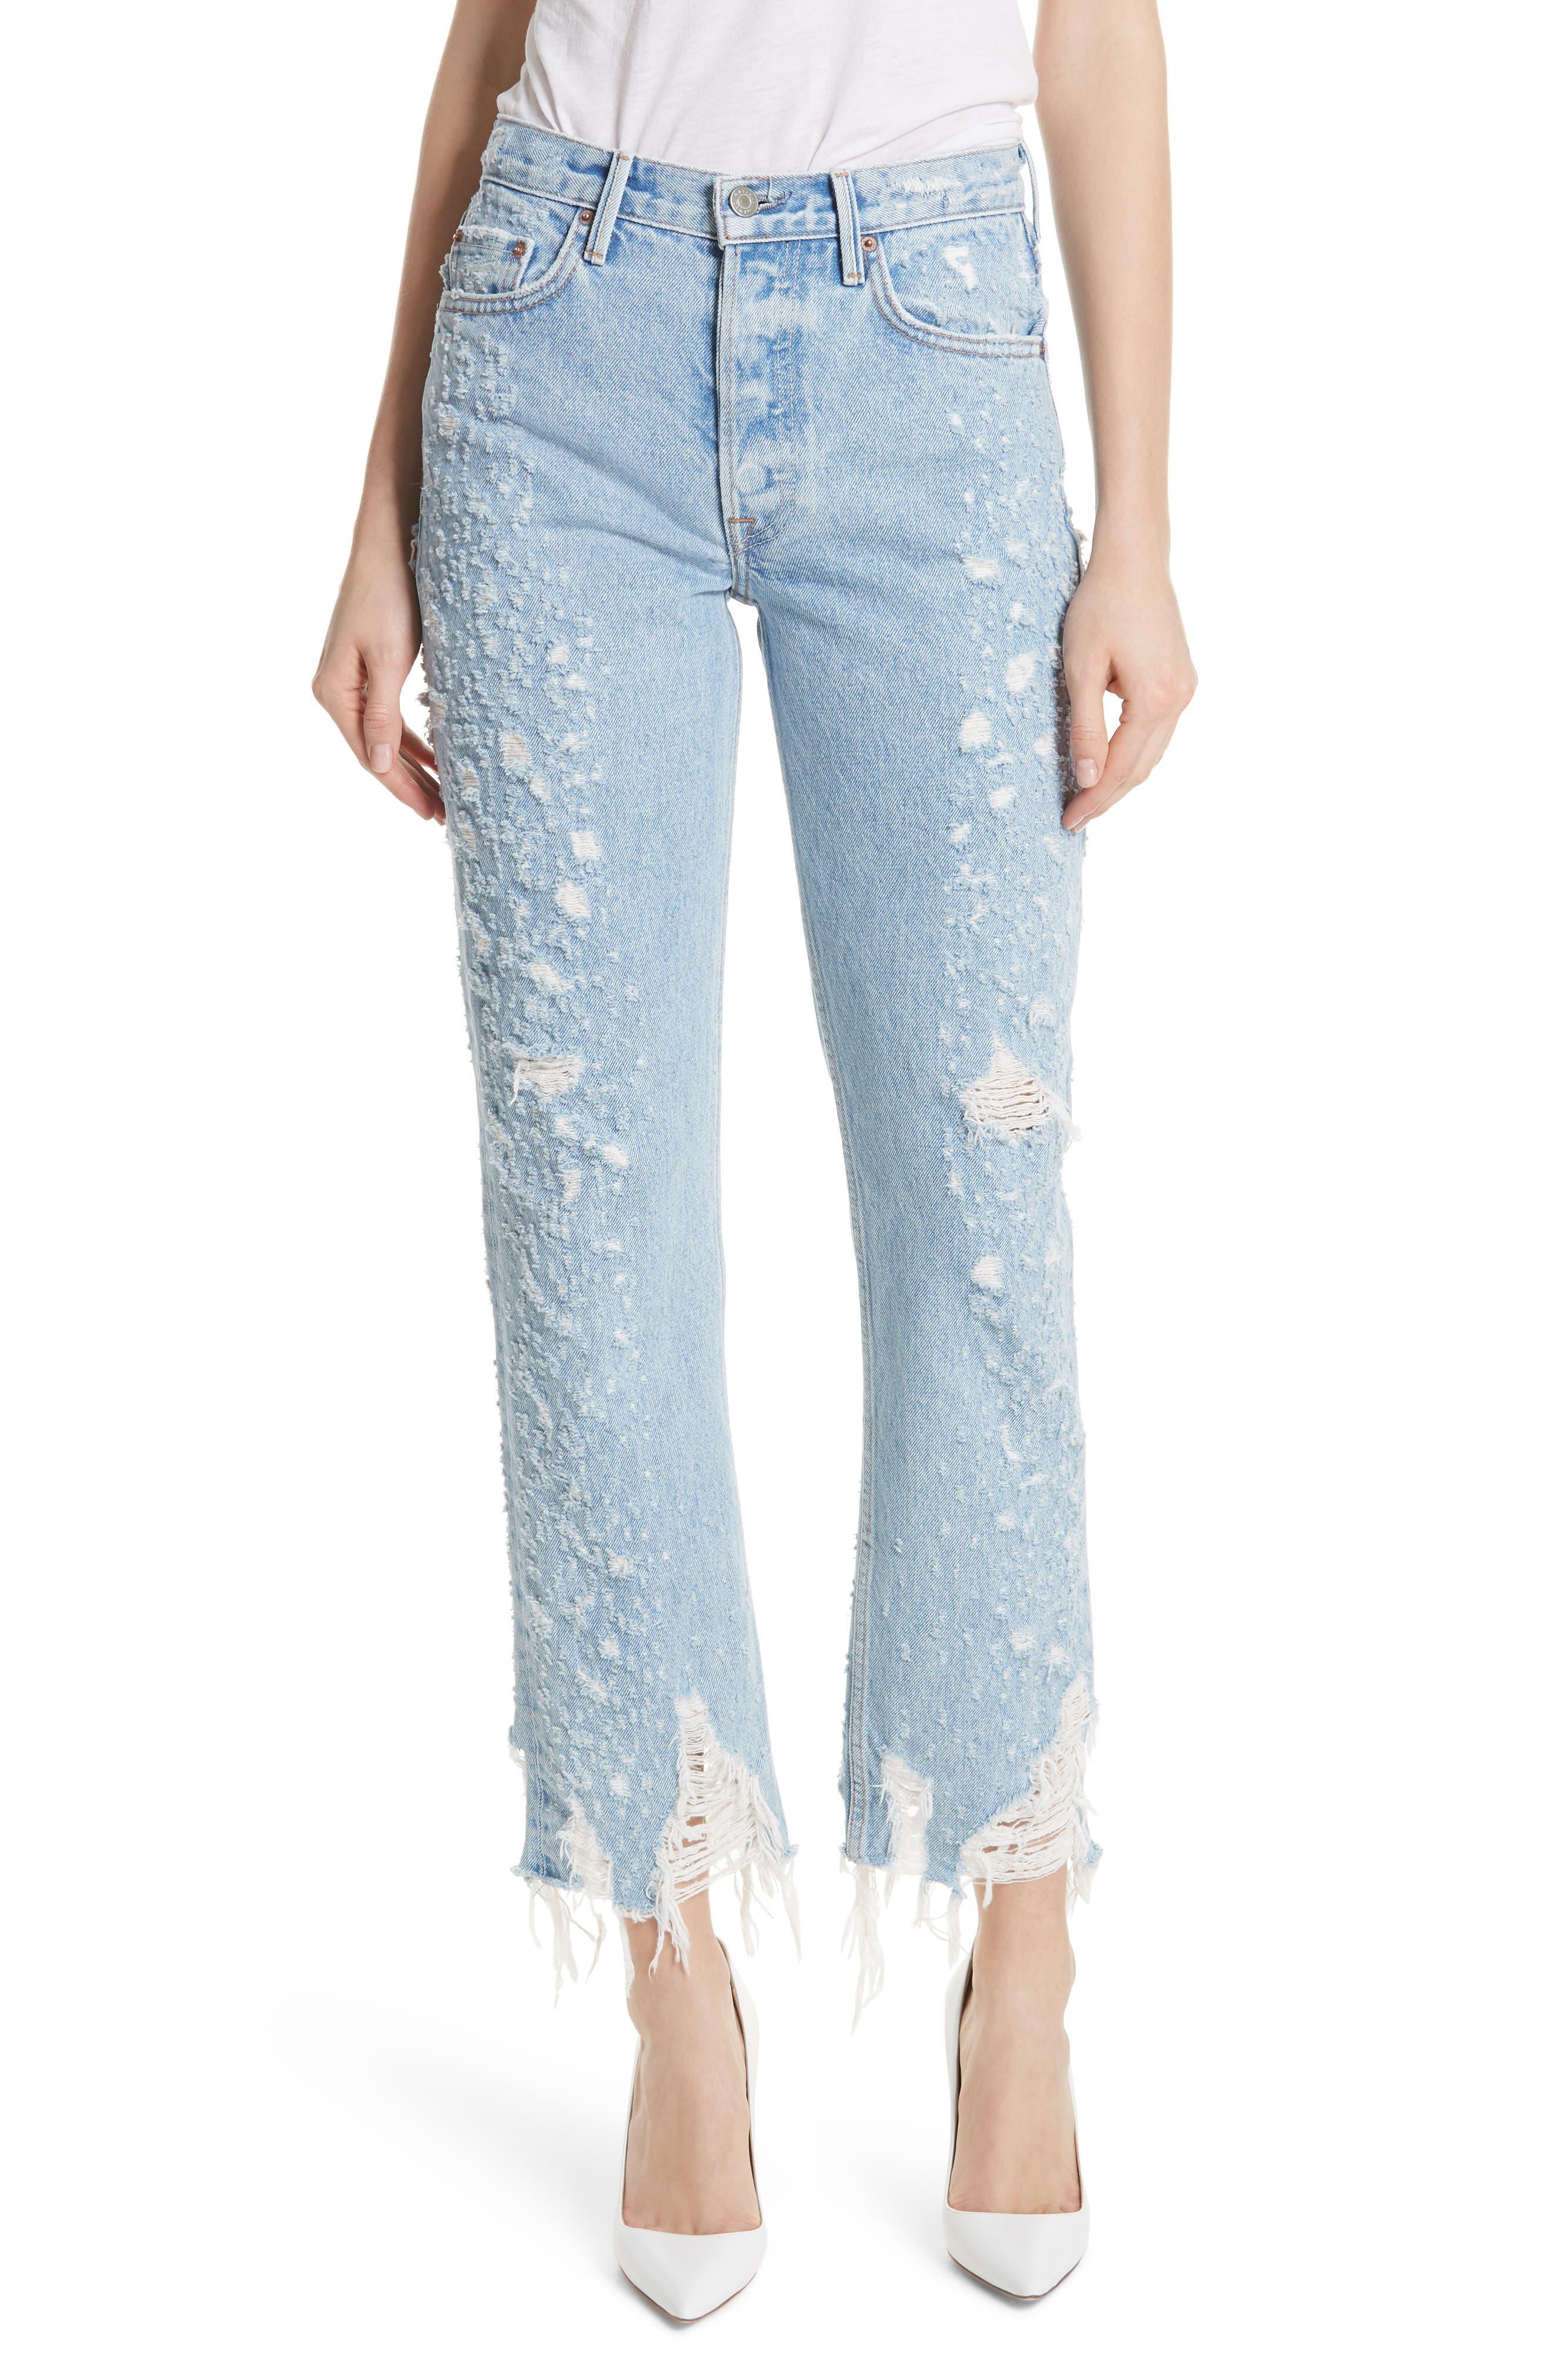 Helena Rigid High Waist Straight Jeans